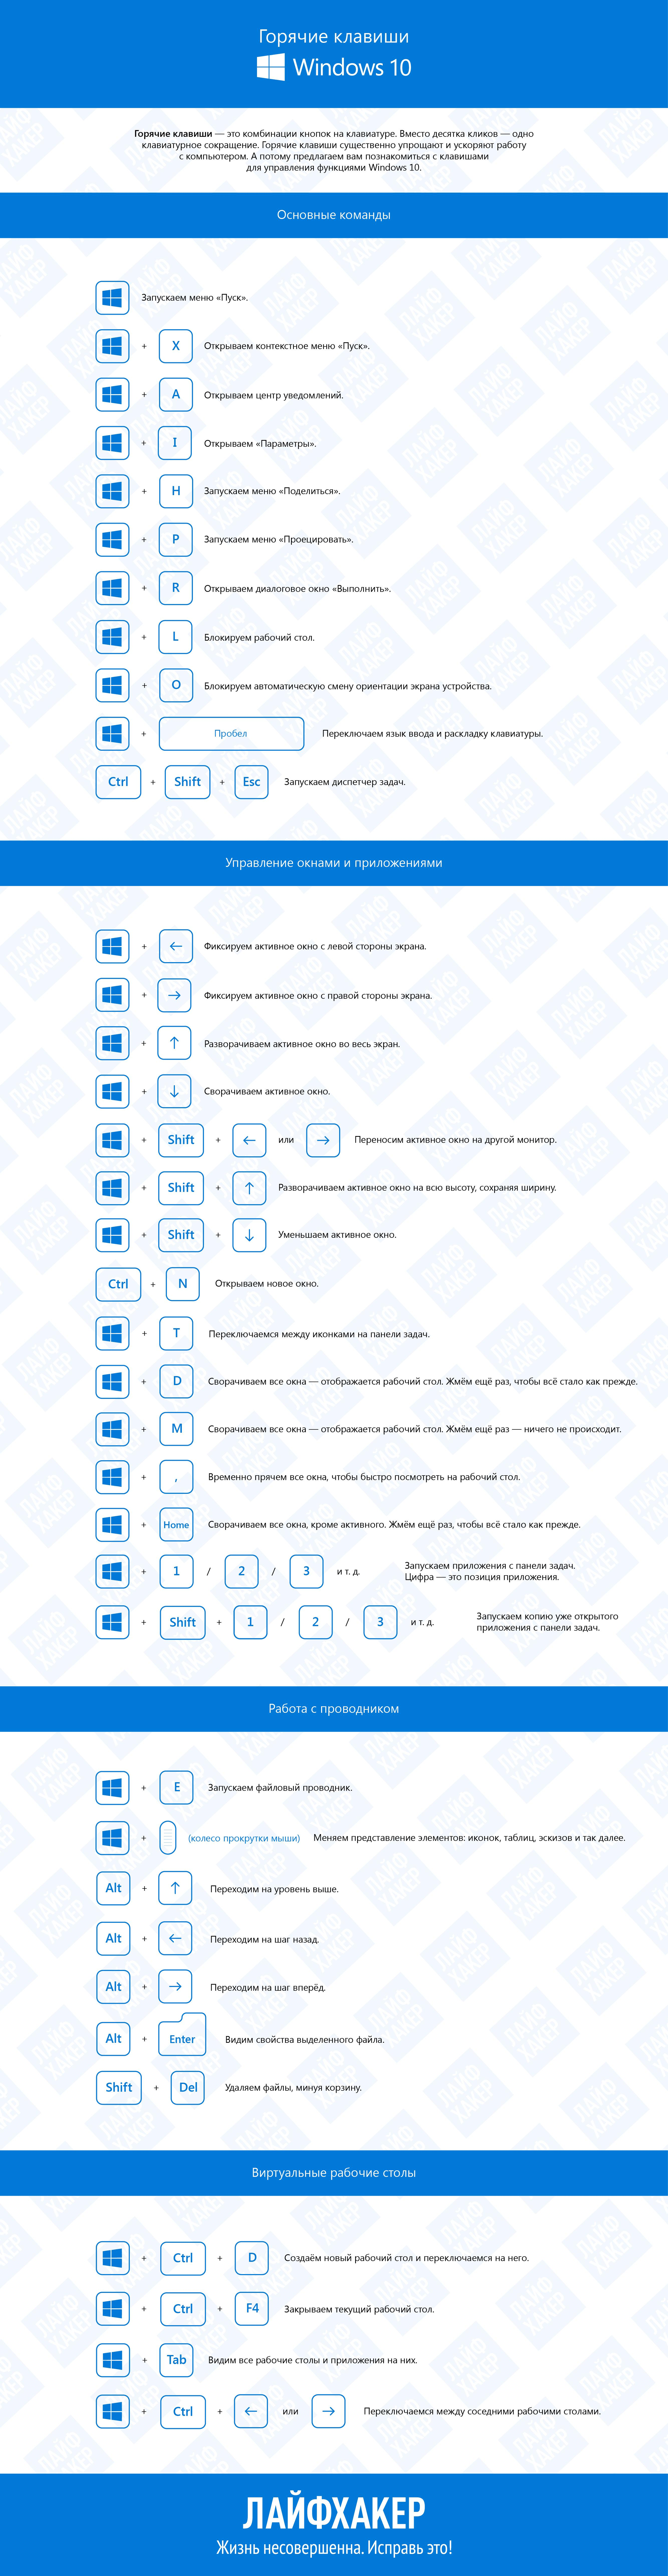 windows10-shortcuts